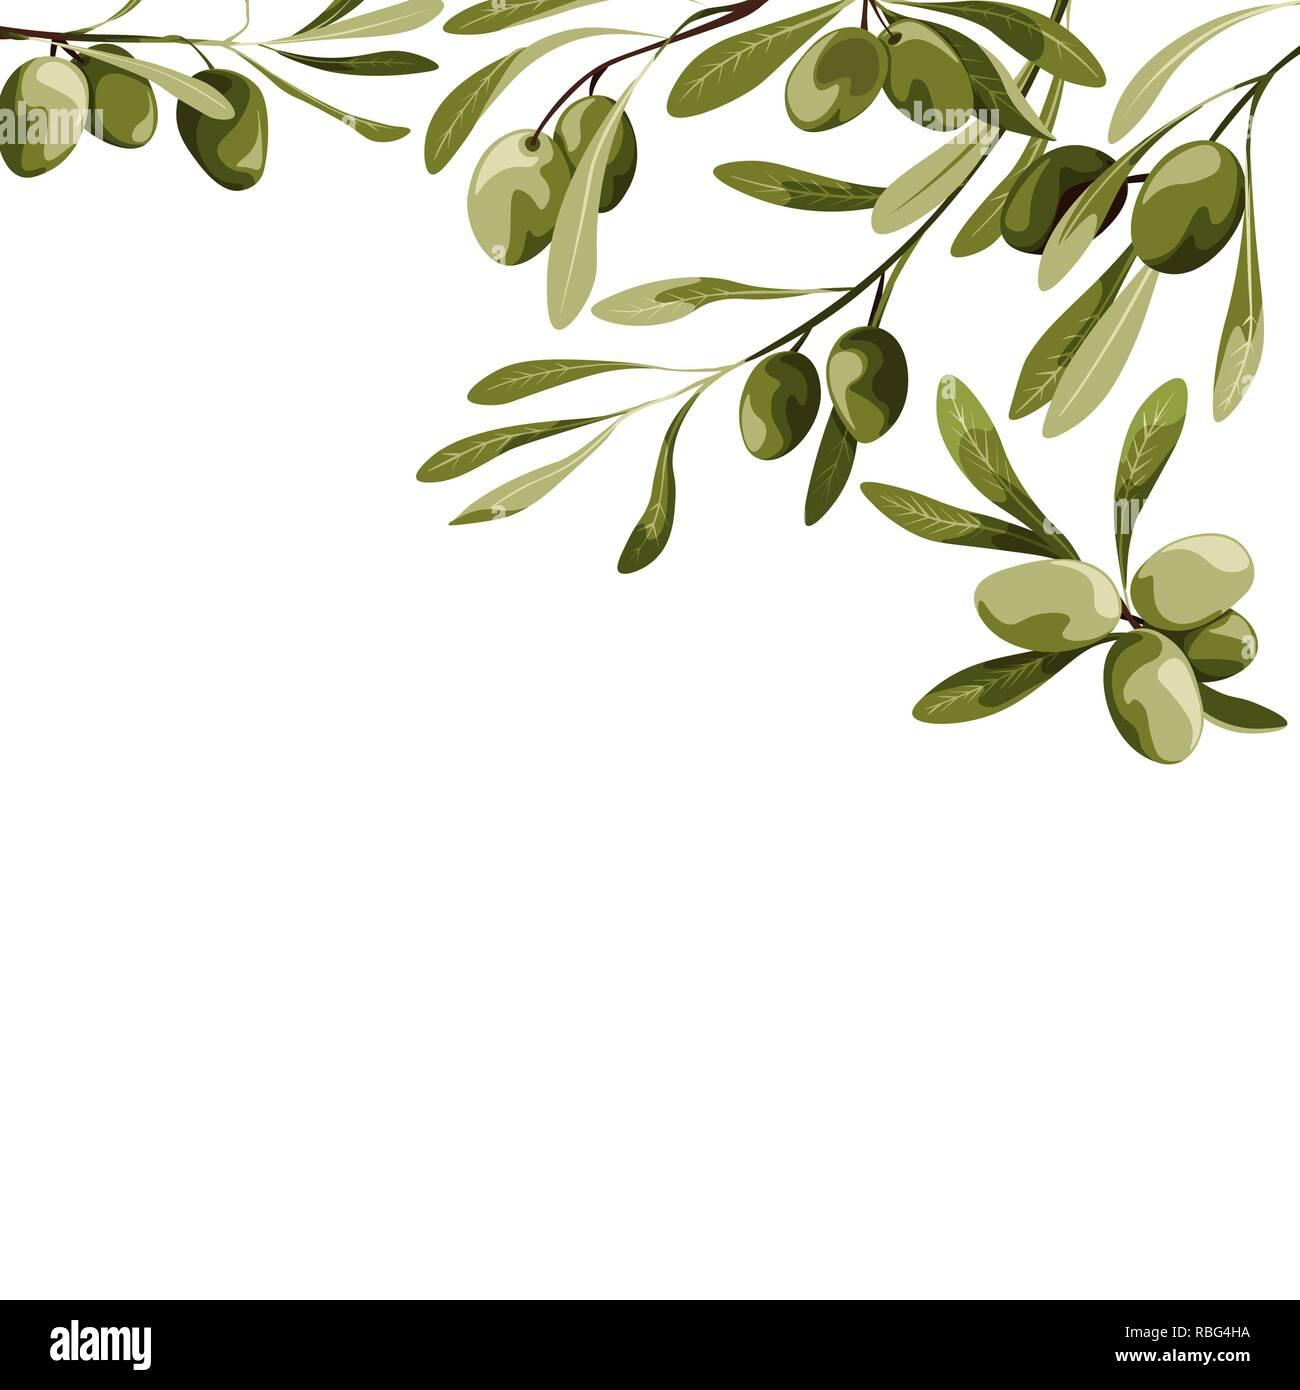 Vector background with olive tree decoration. Vegan food illustration - Stock Image